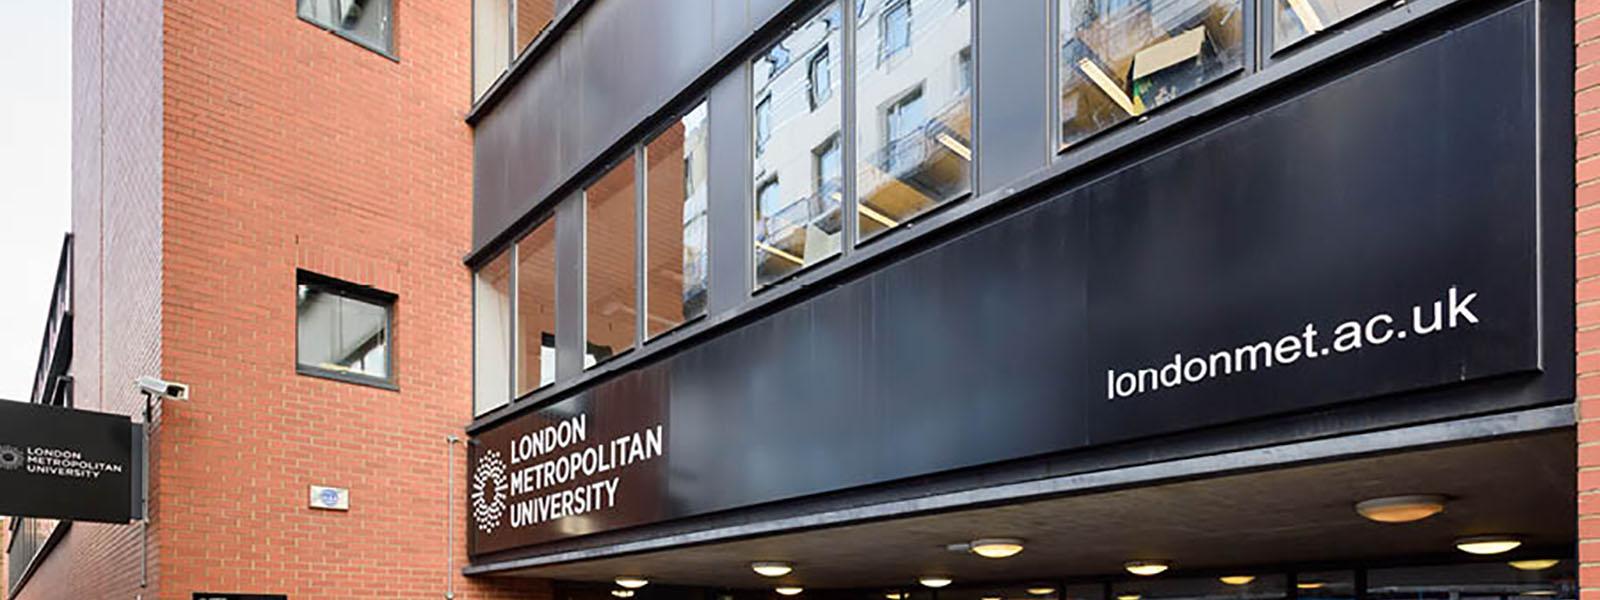 Валидиран партнер на Лондон Метрополитан Универзитет